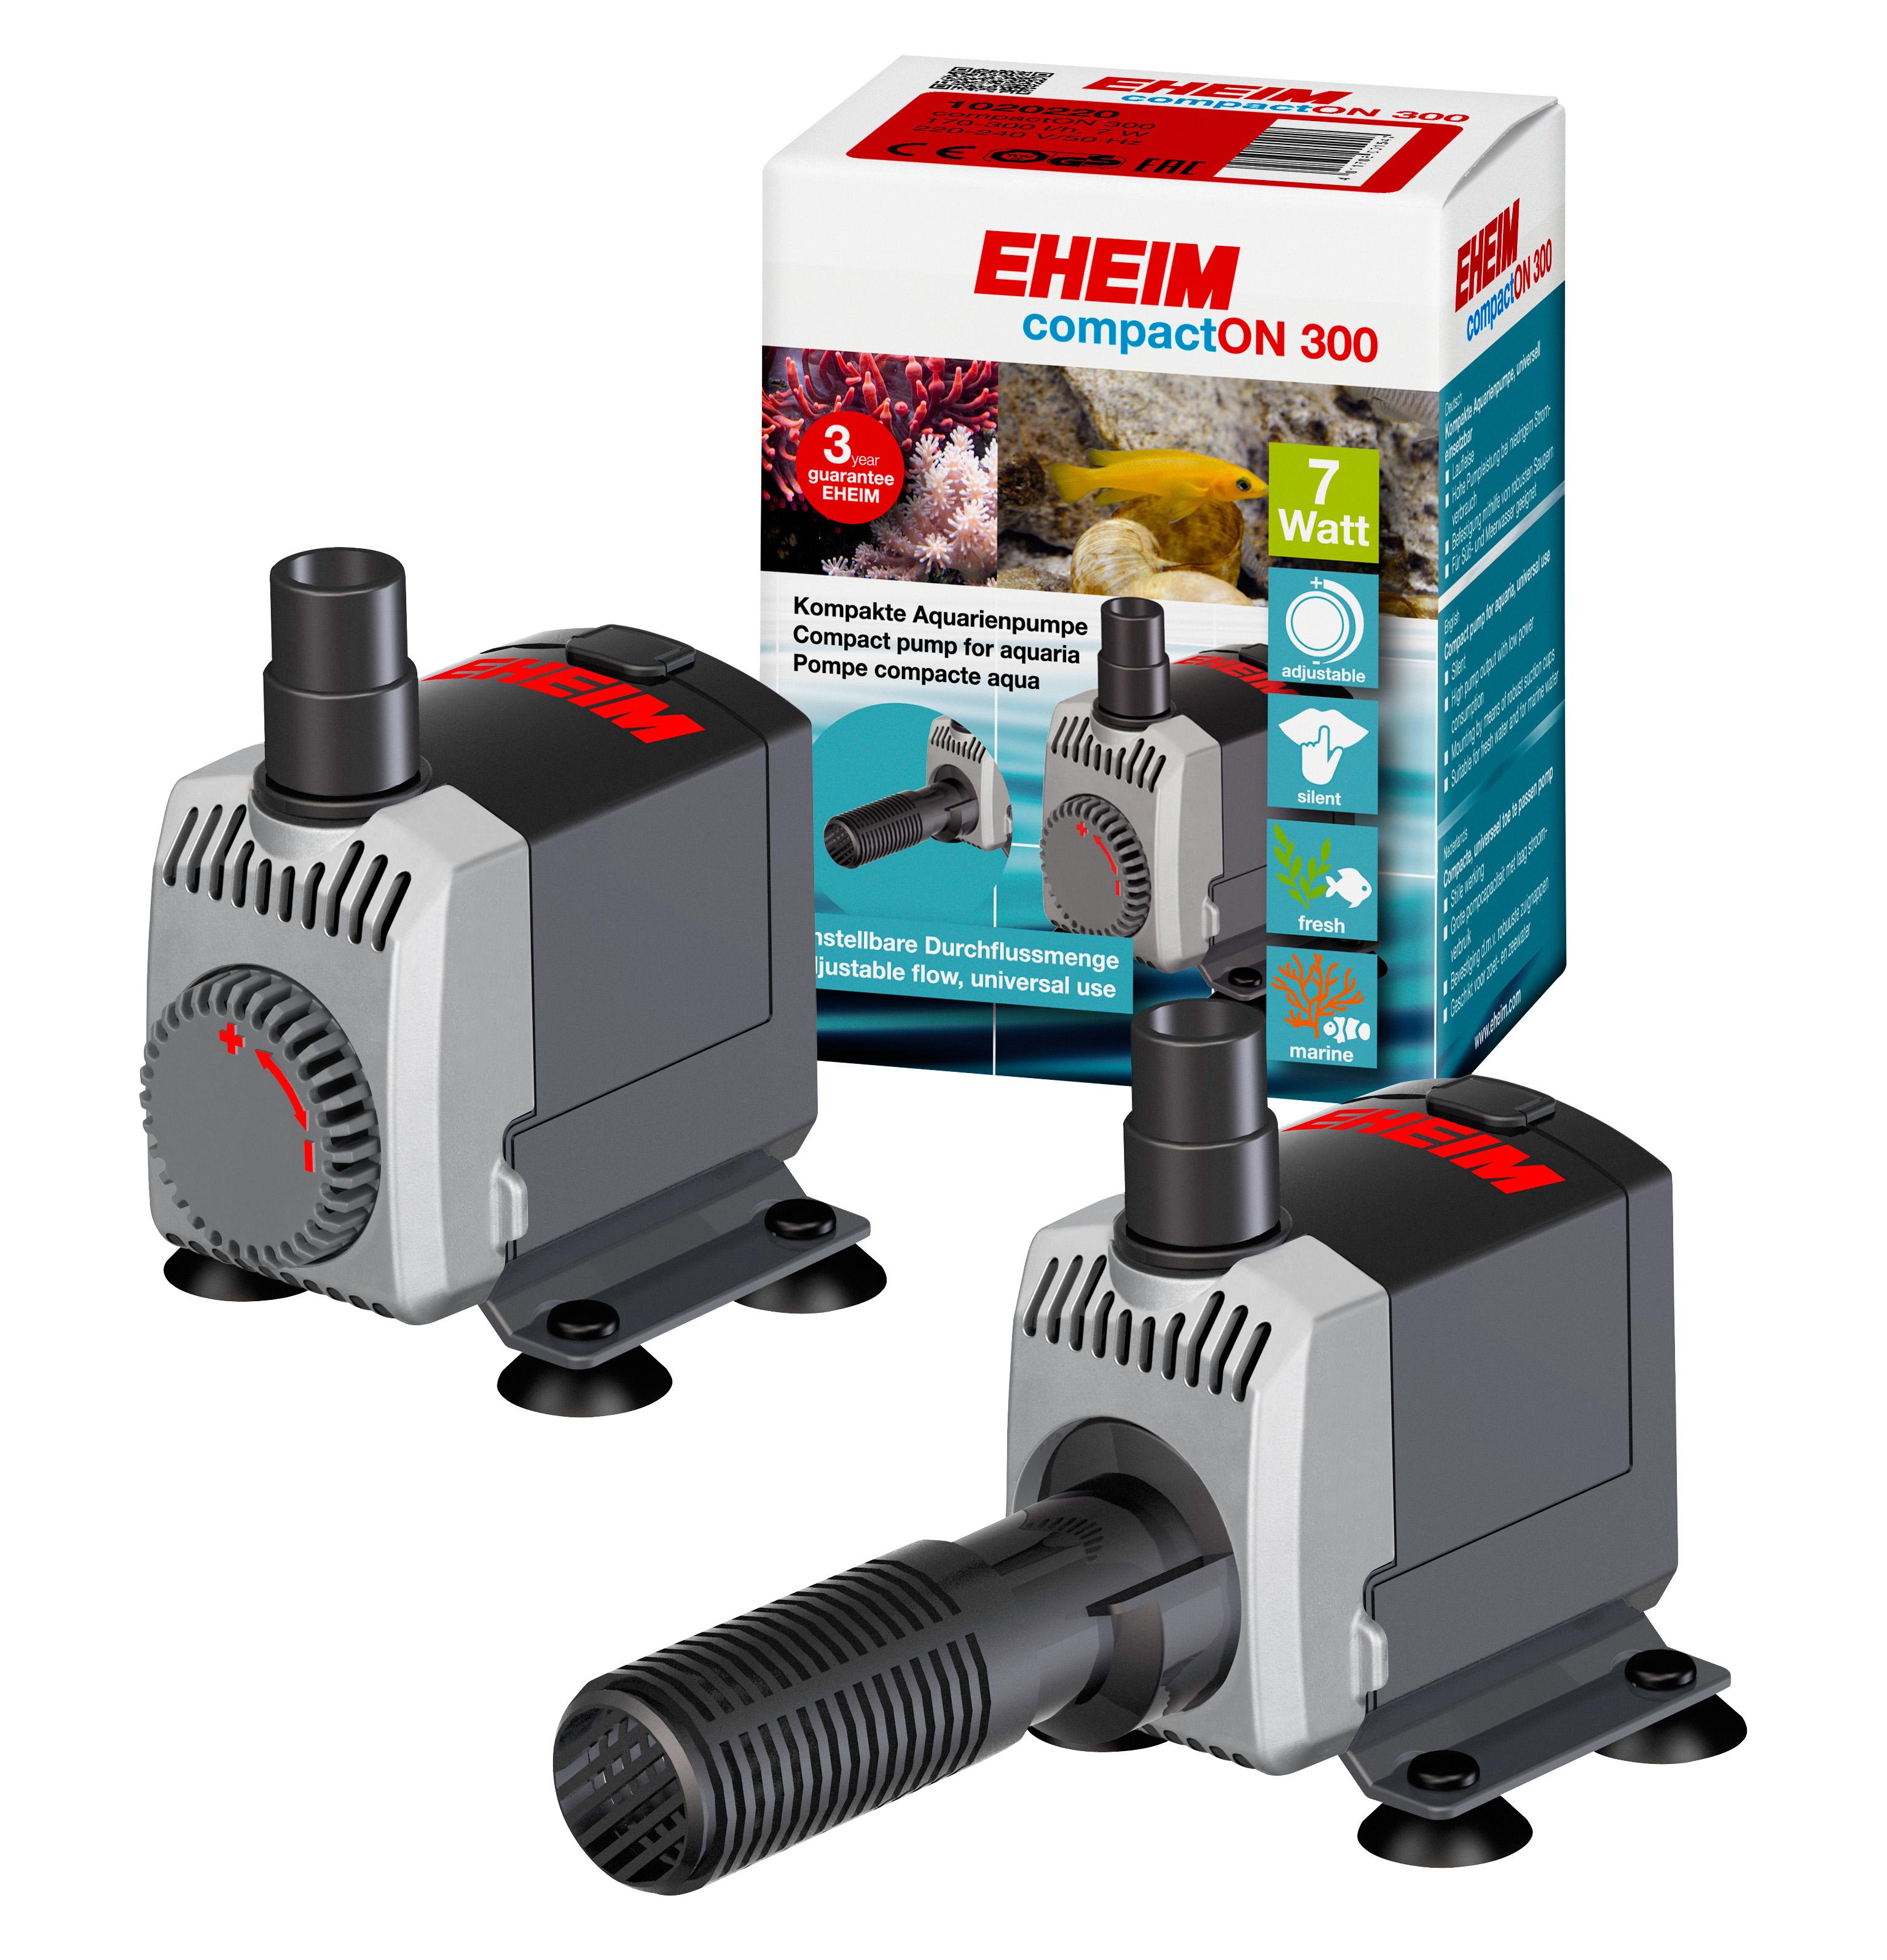 EHEIM compactON 300